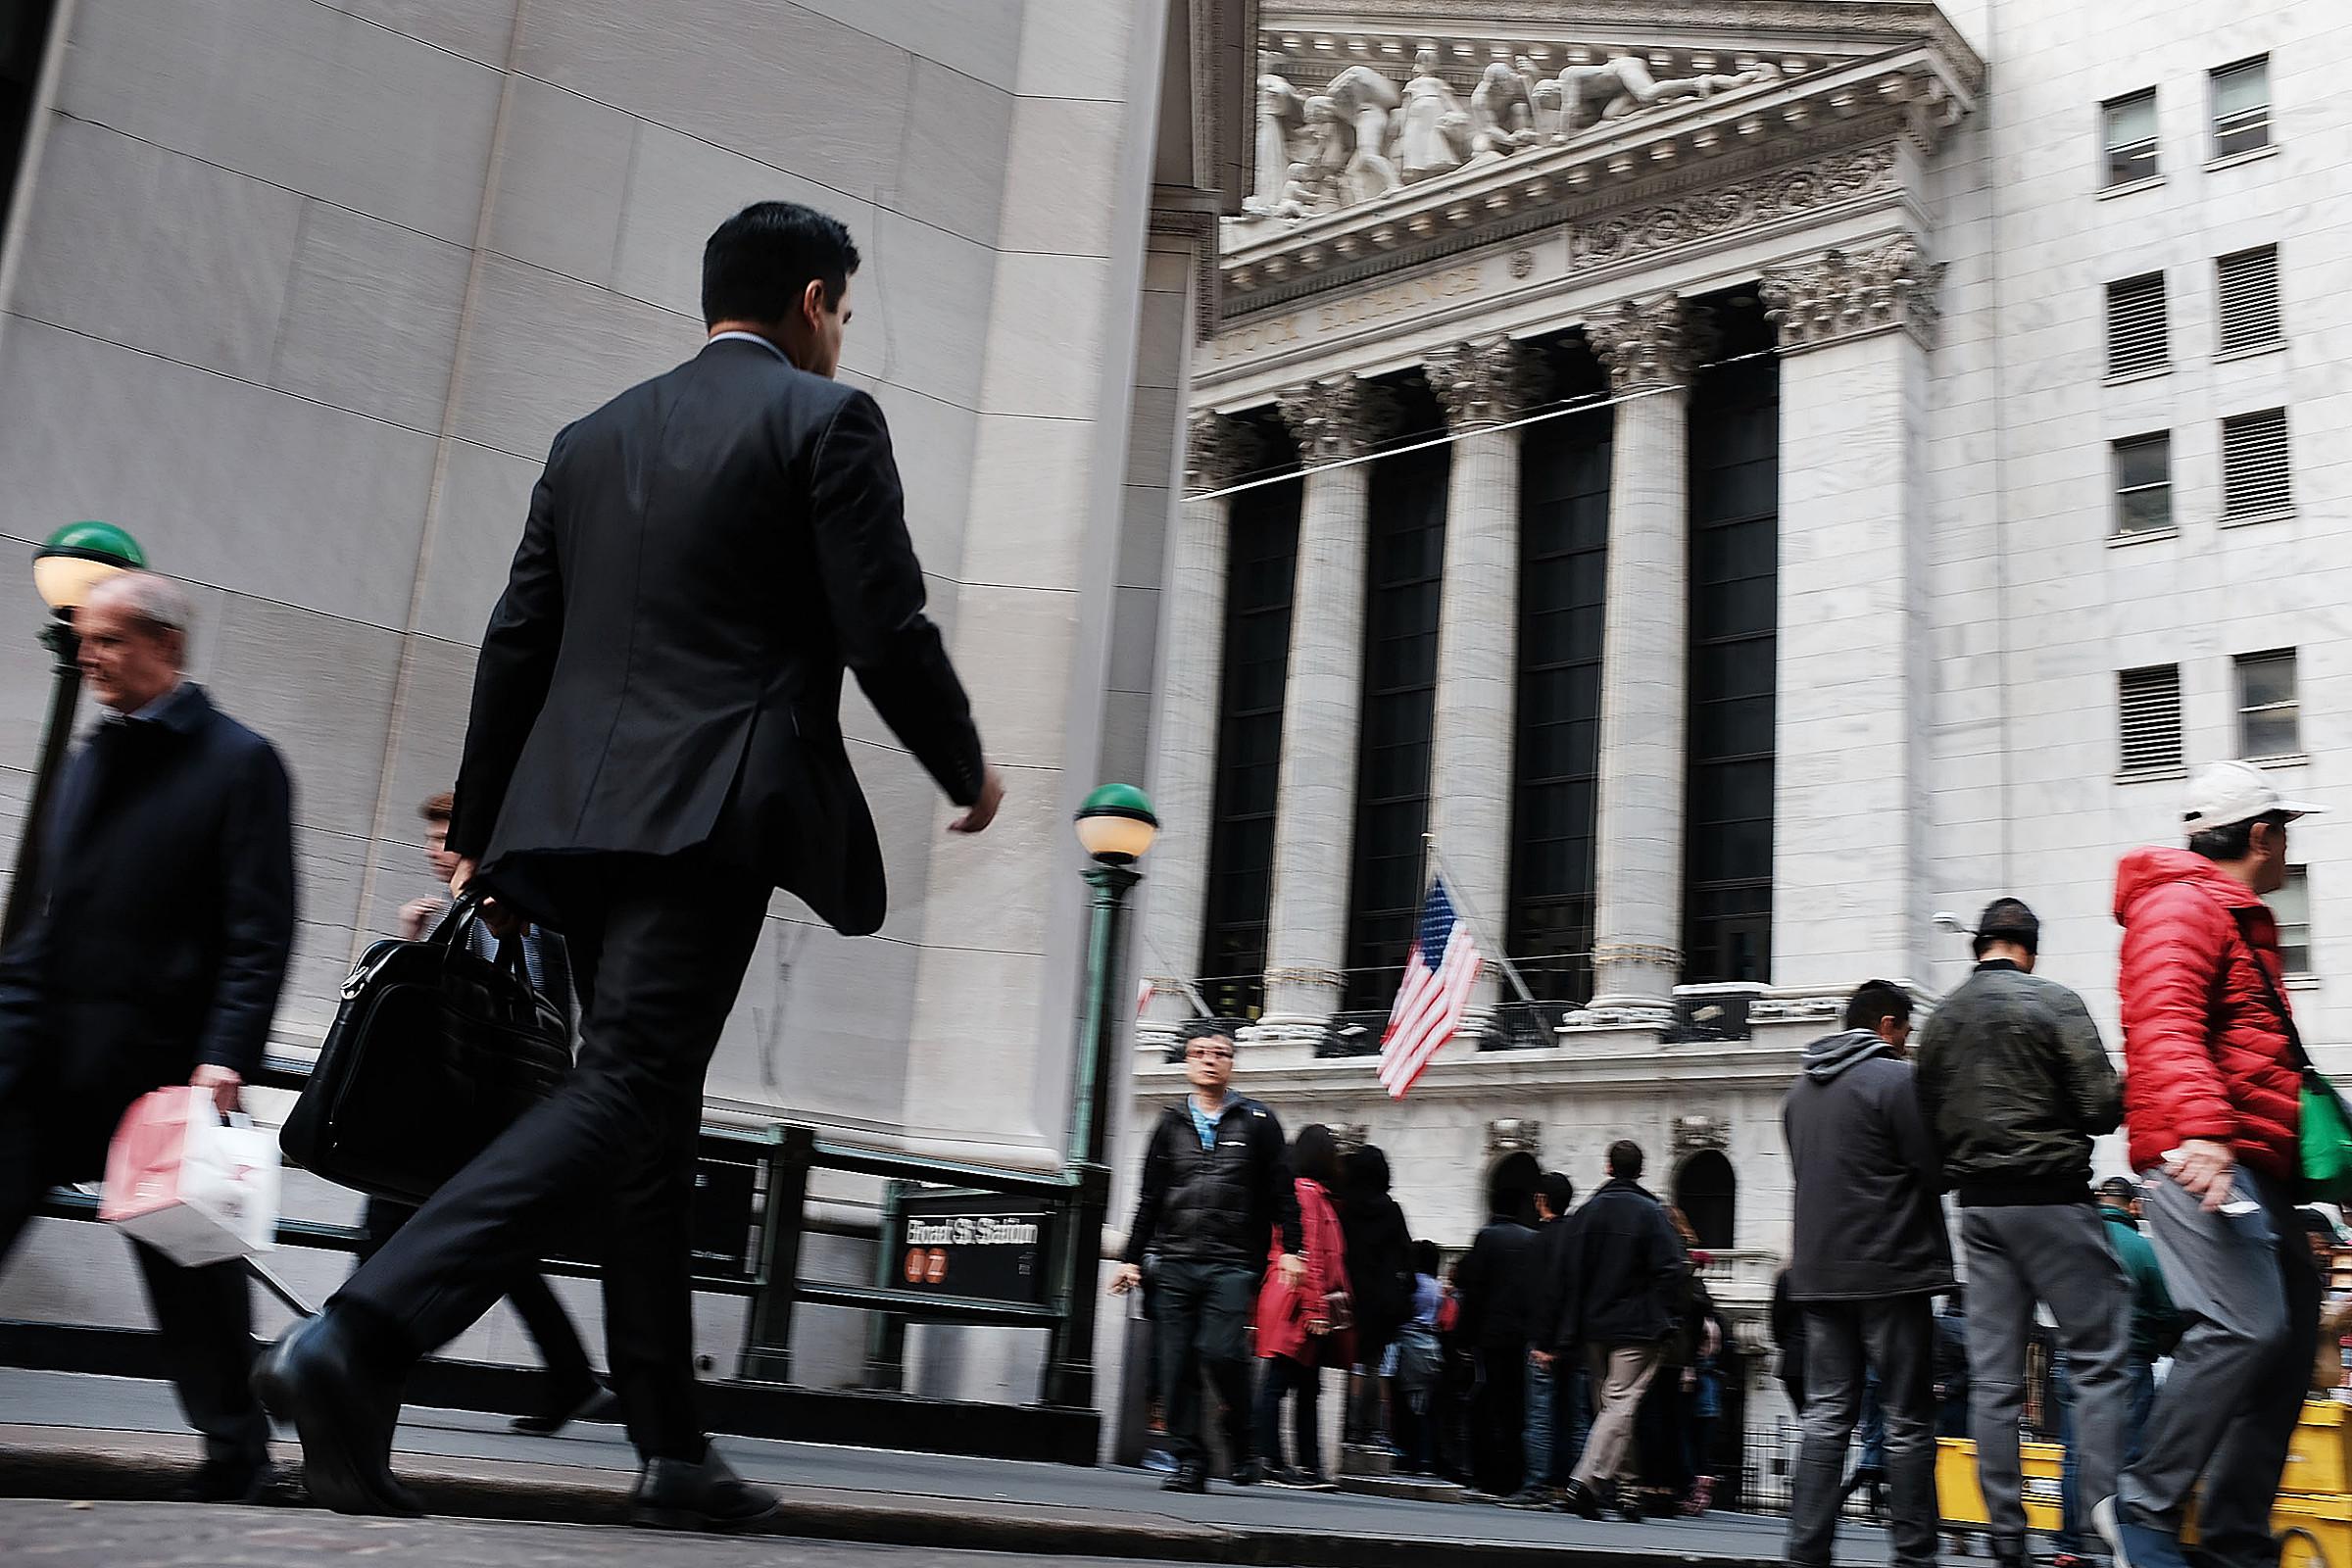 Бизнисмен иде у смеру ка Њујоршкој берзи на Волстриту, 23. октобар 2018. (Фото: Spencer Platt/Getty Images)